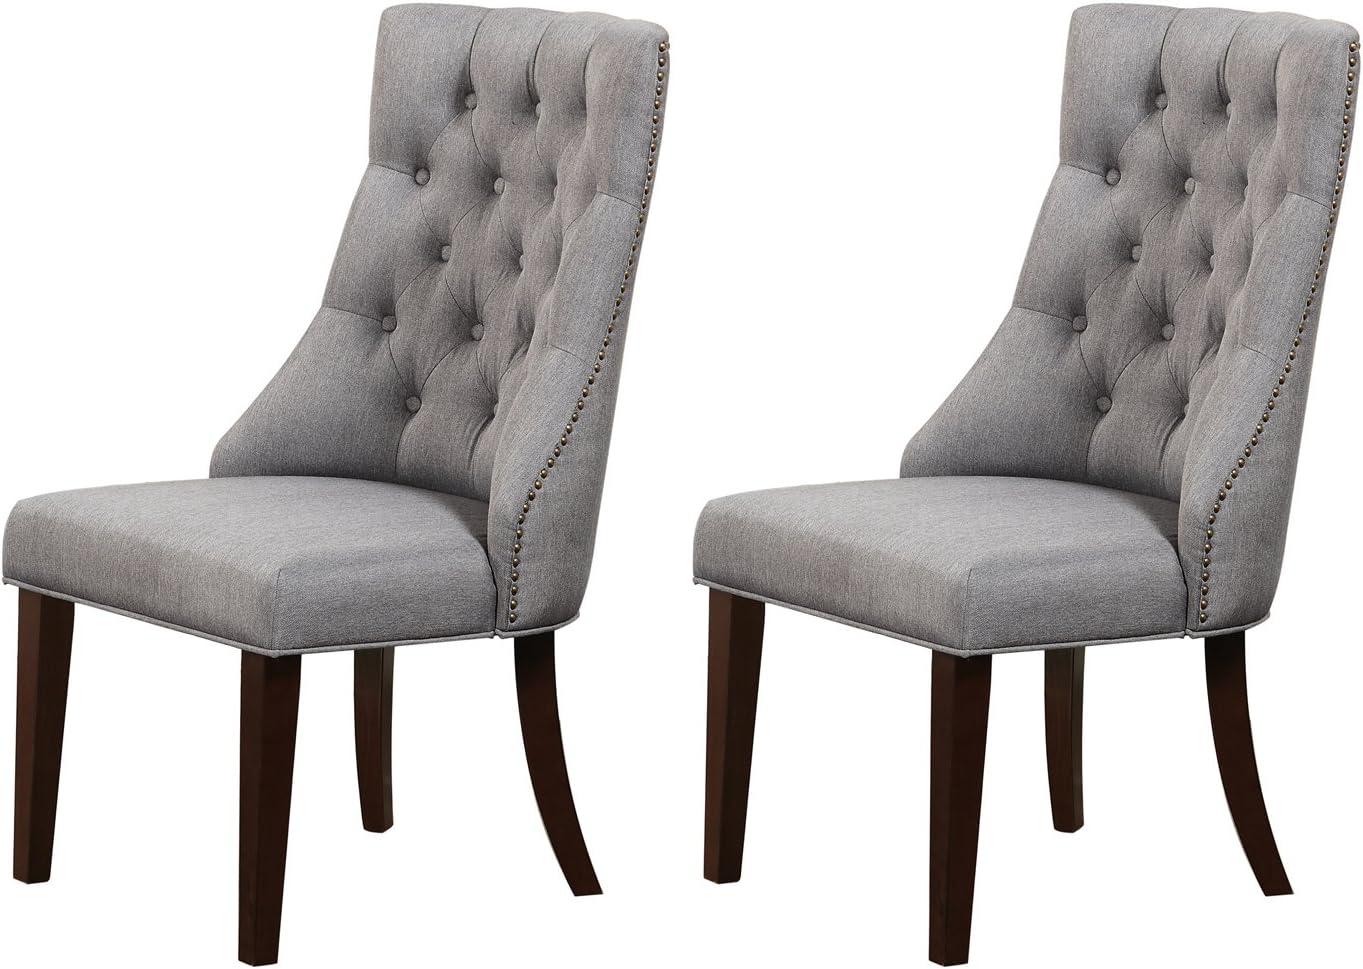 Gramercy Furniture Alexa Accent Chair